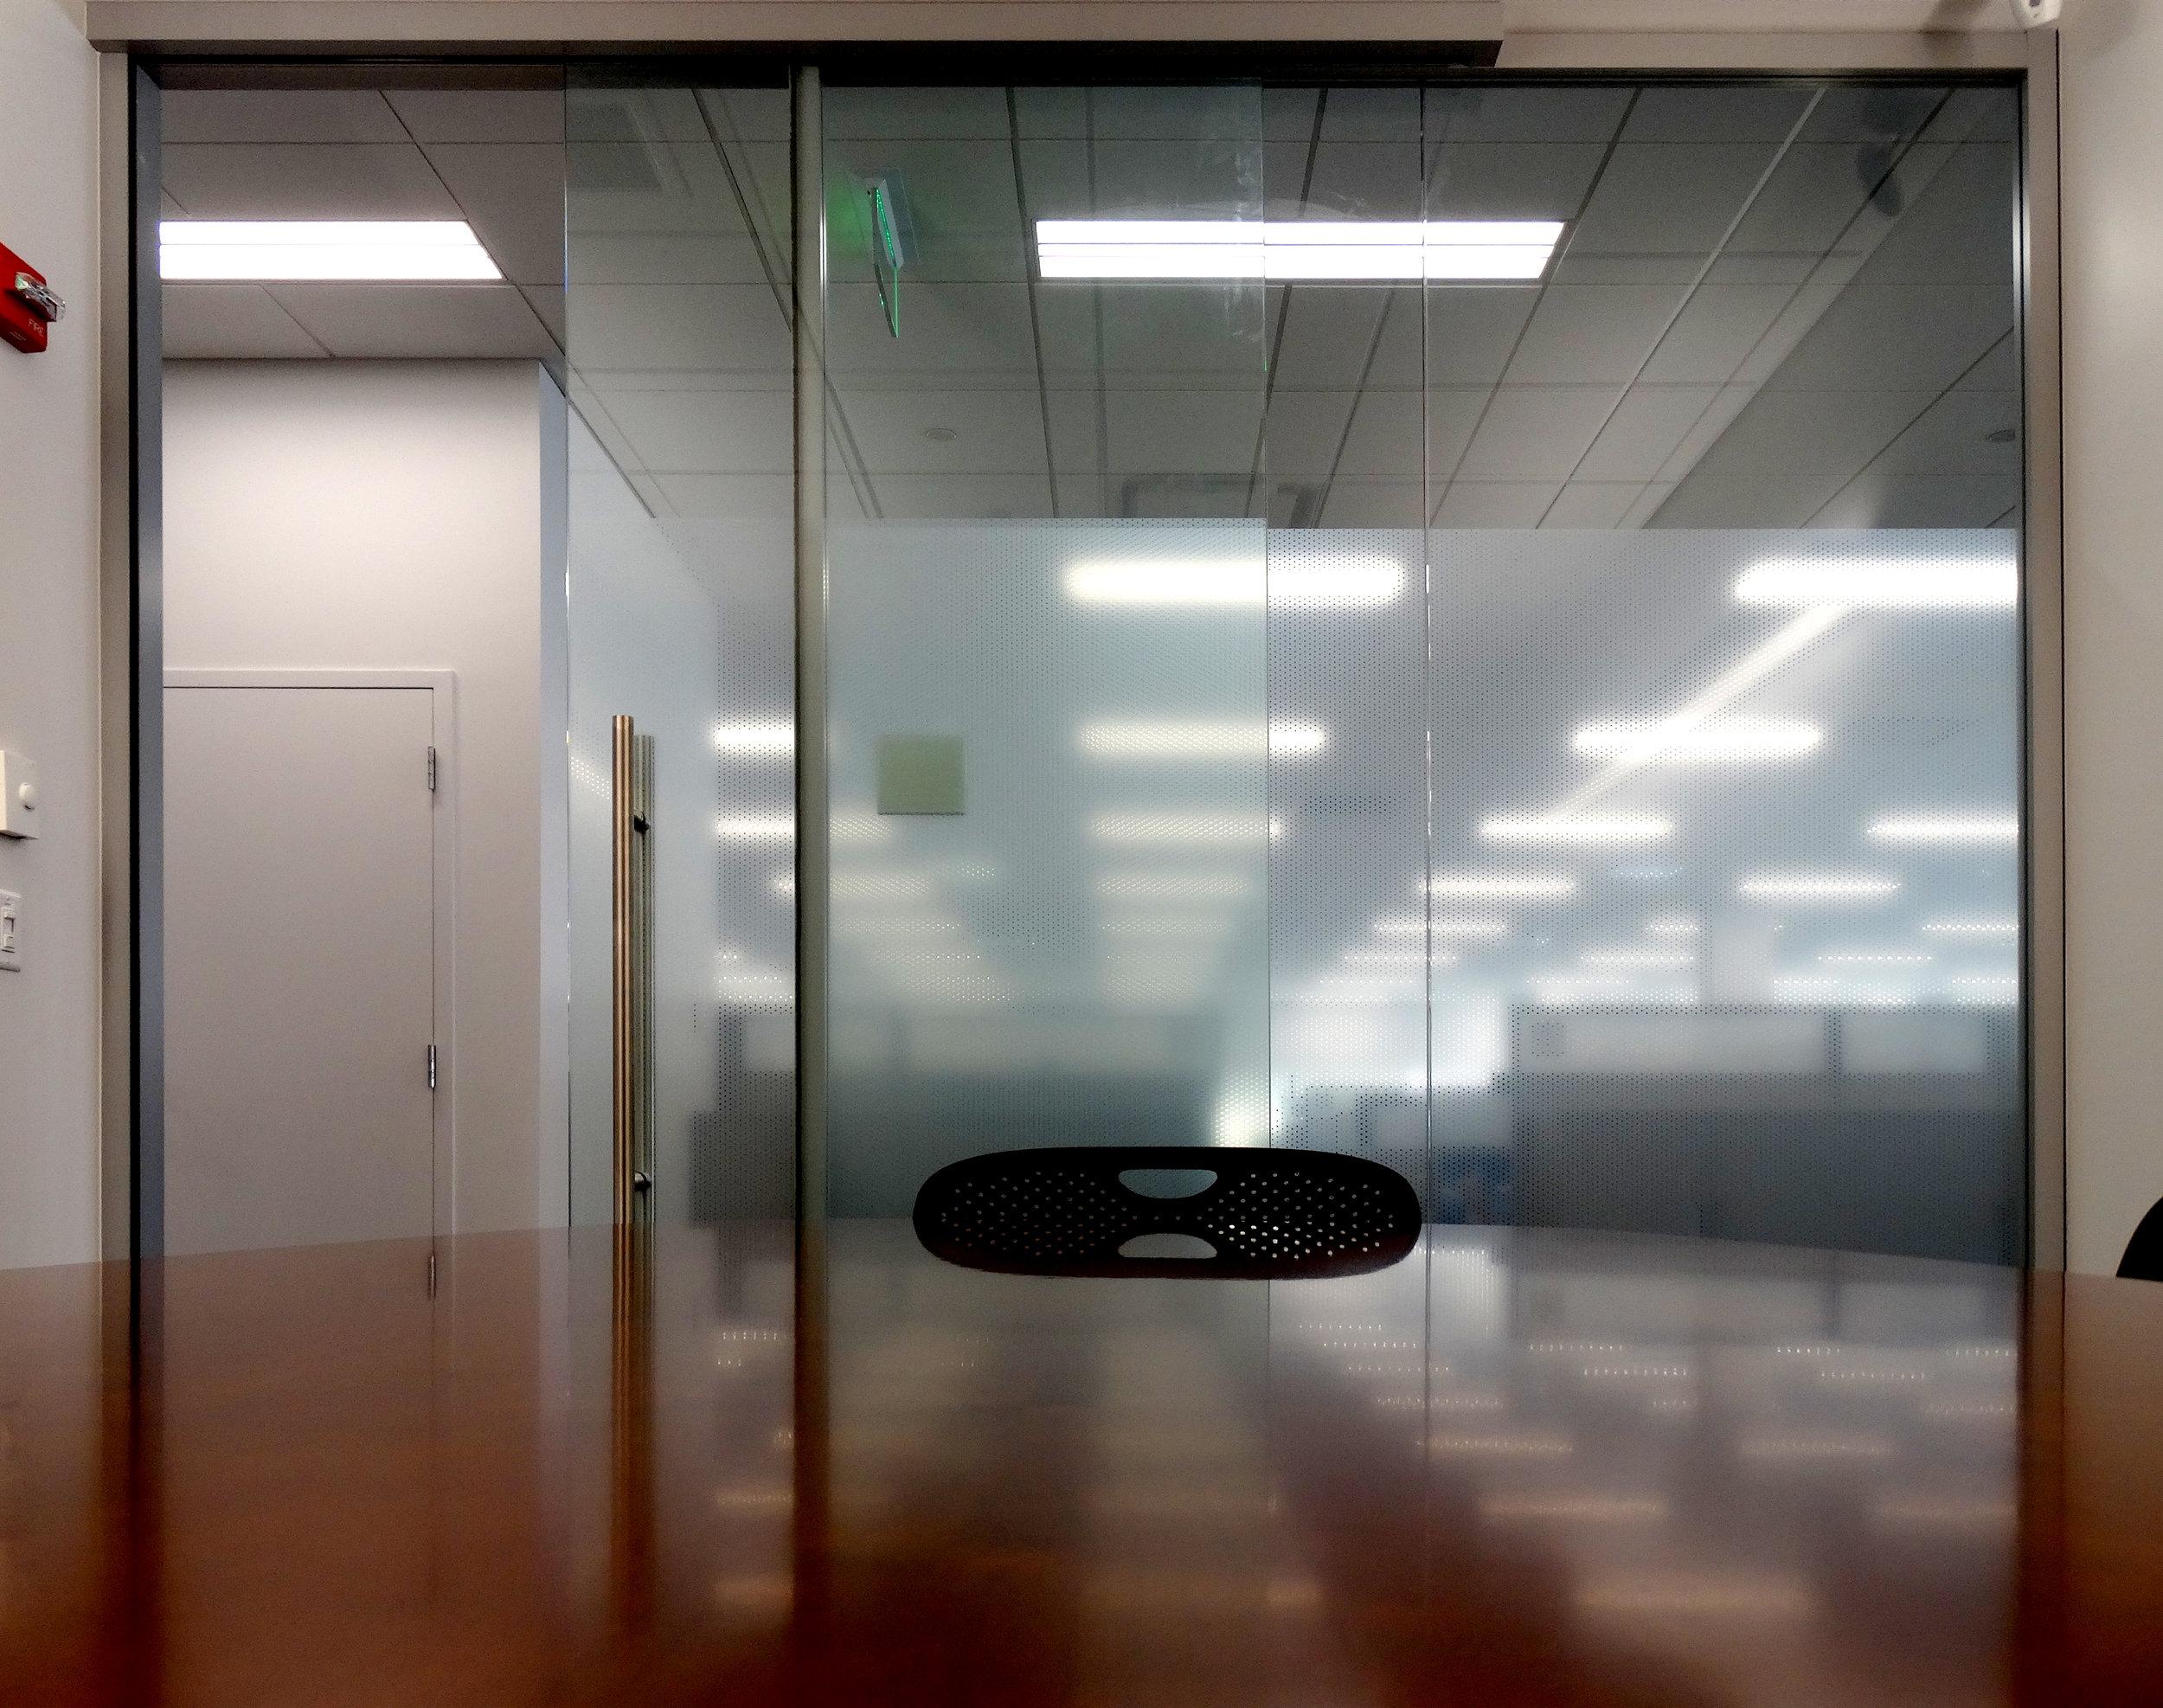 Litespace Frameless Glass Conference Room Wall Sliding Door - Spaceworks AI.jpg